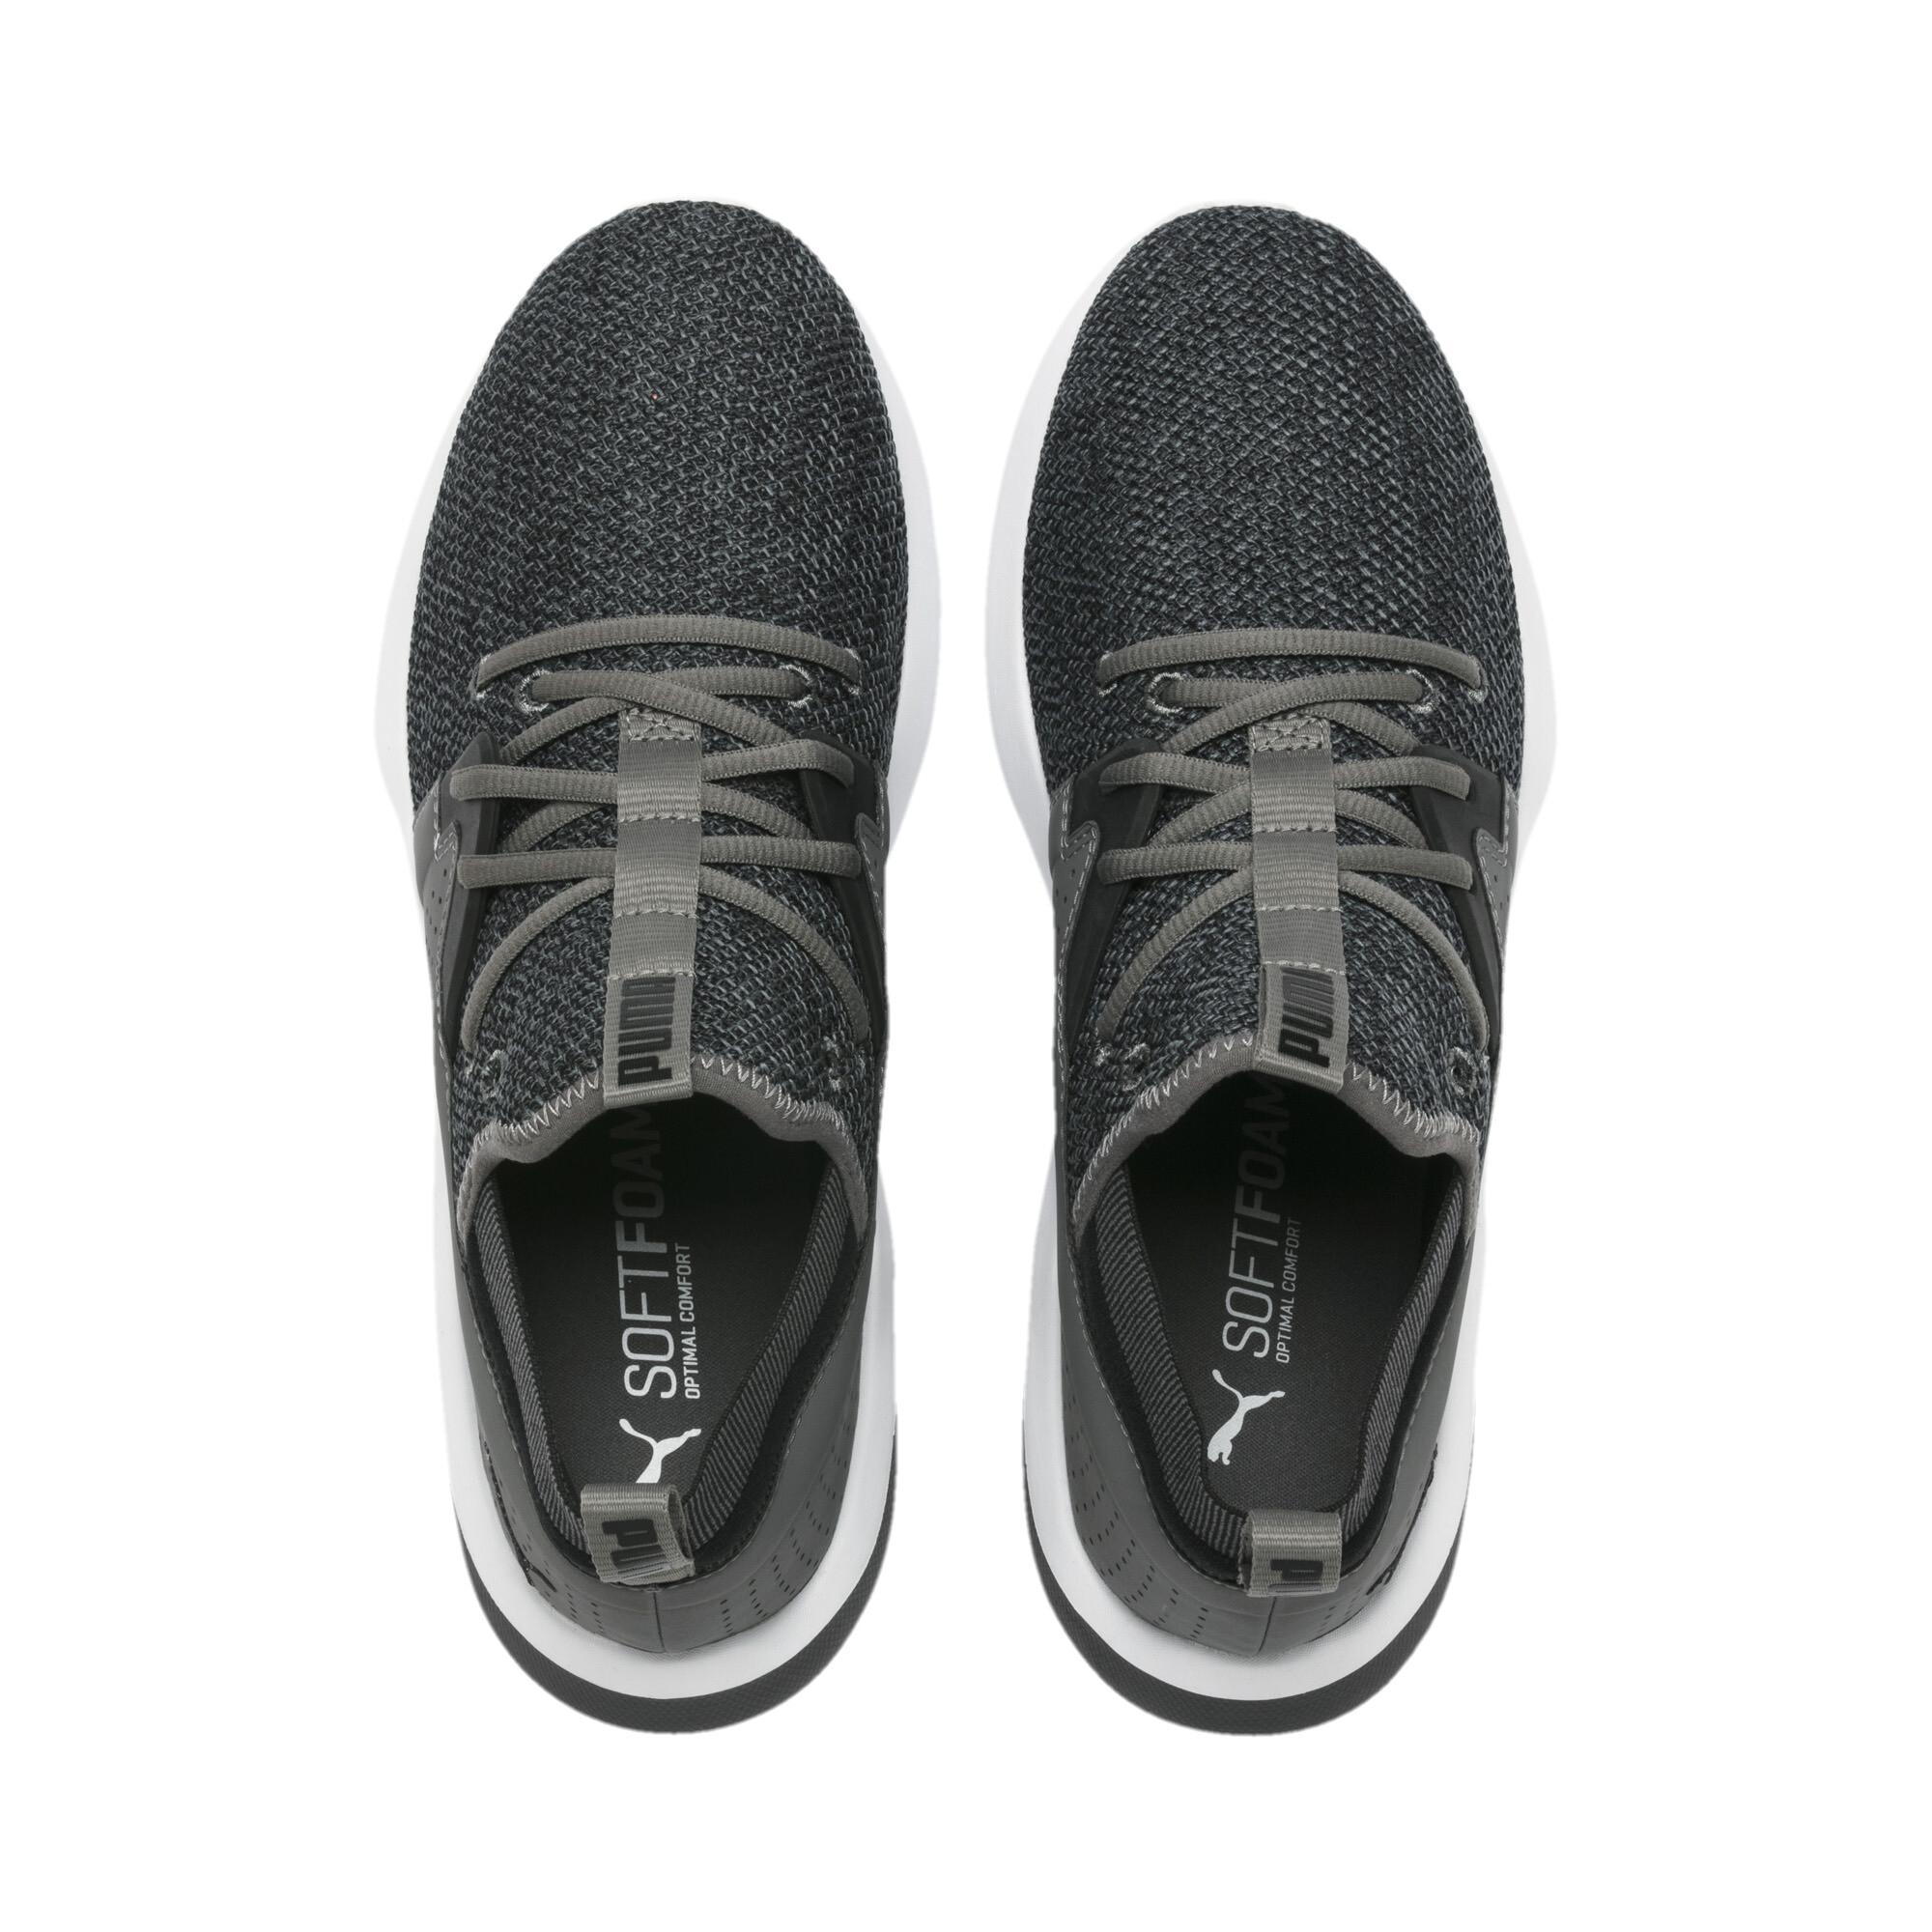 PUMA-Emergence-Men-039-s-Sneakers-Men-Shoe-Running thumbnail 20